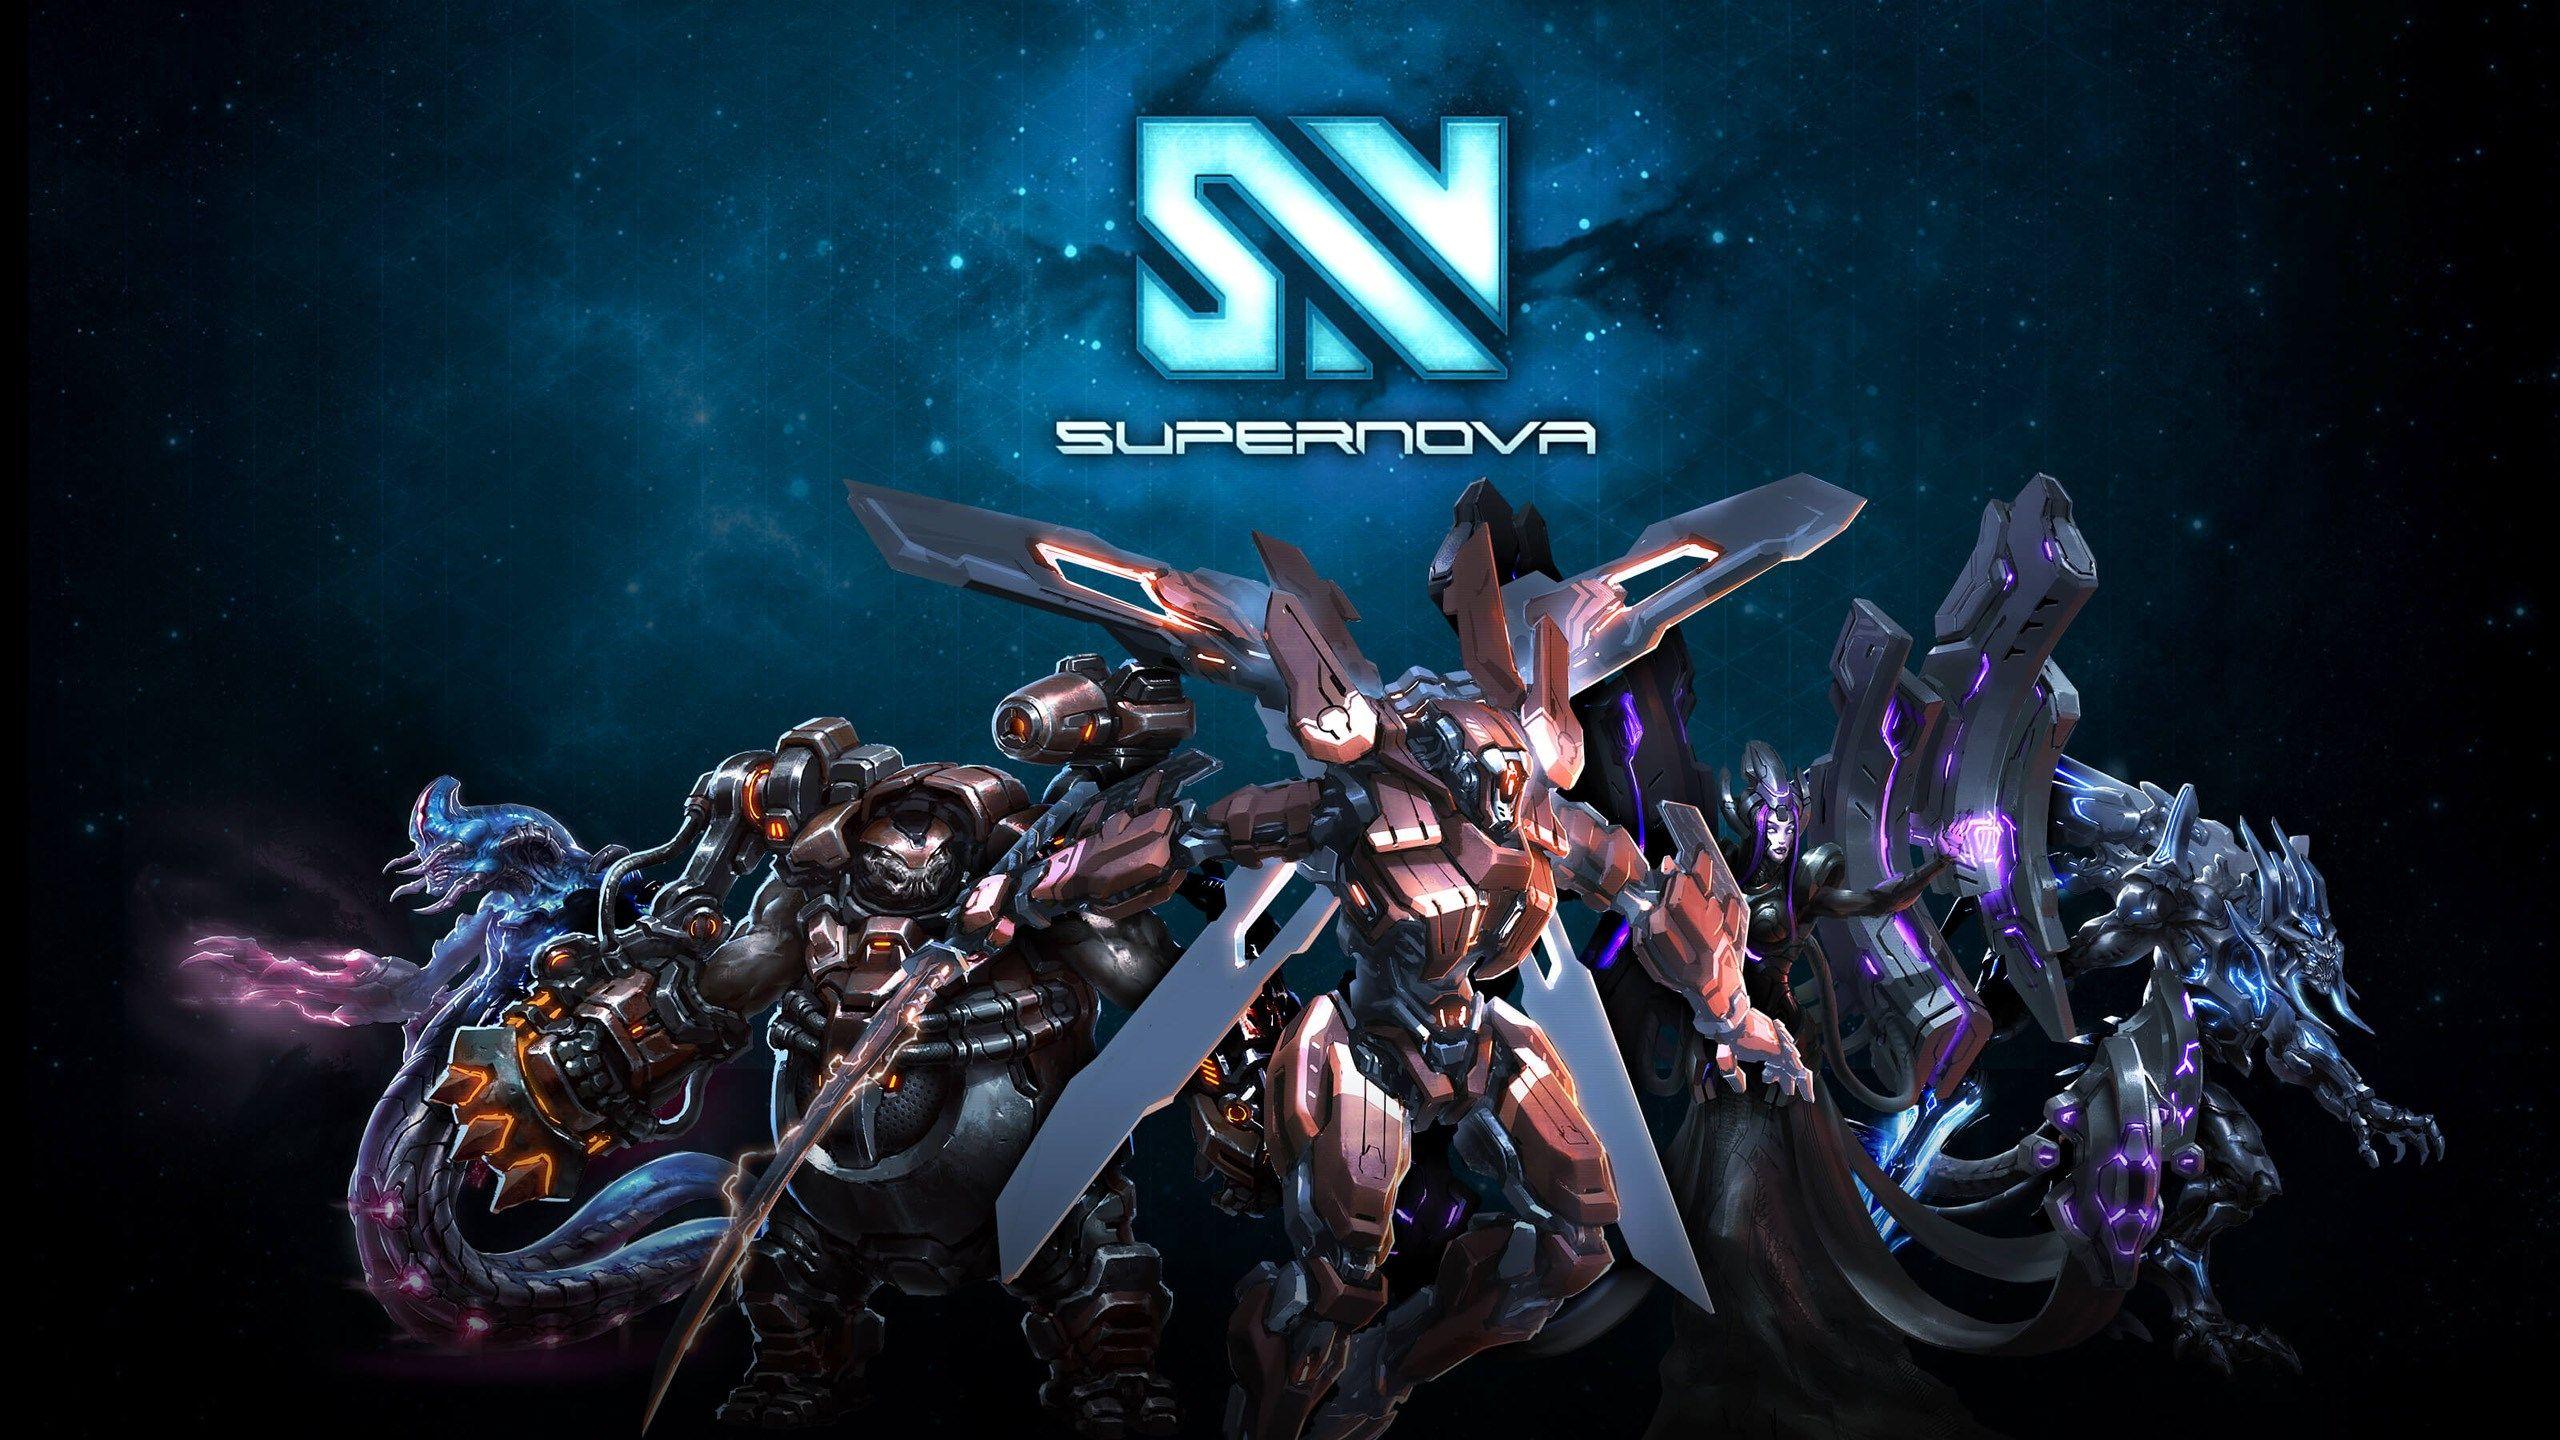 2560x1440 Supernova game wallpaper Games, Xbox, Android